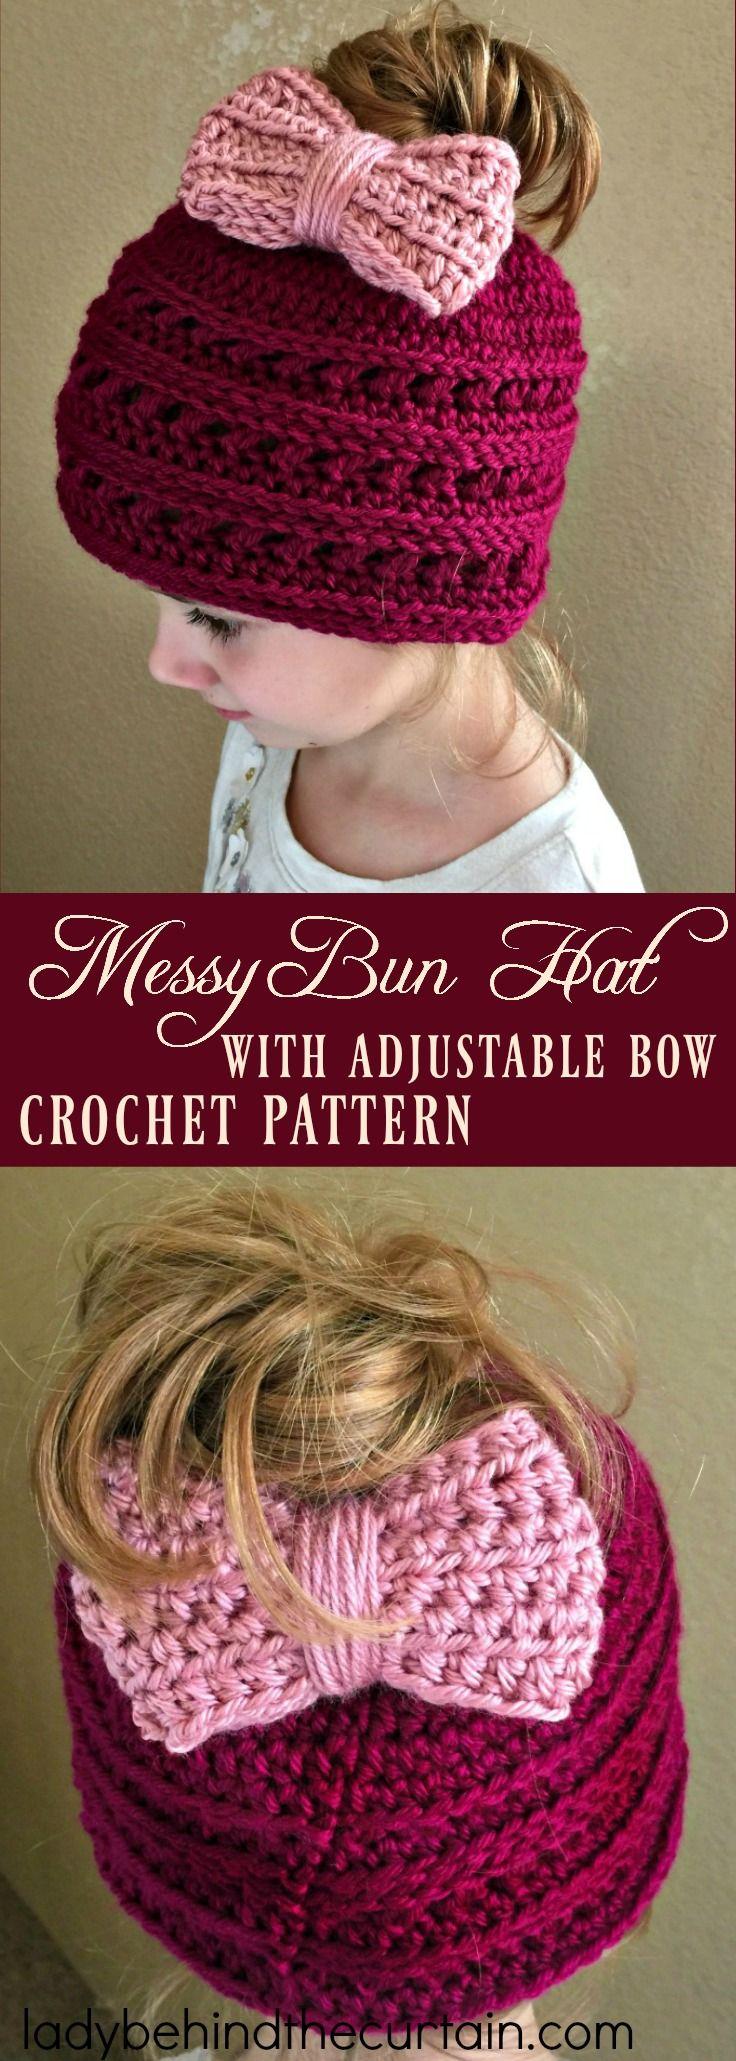 Messy Bun Hat with Adjustable Bow Crochet Pattern | Gorros, Tejido y ...